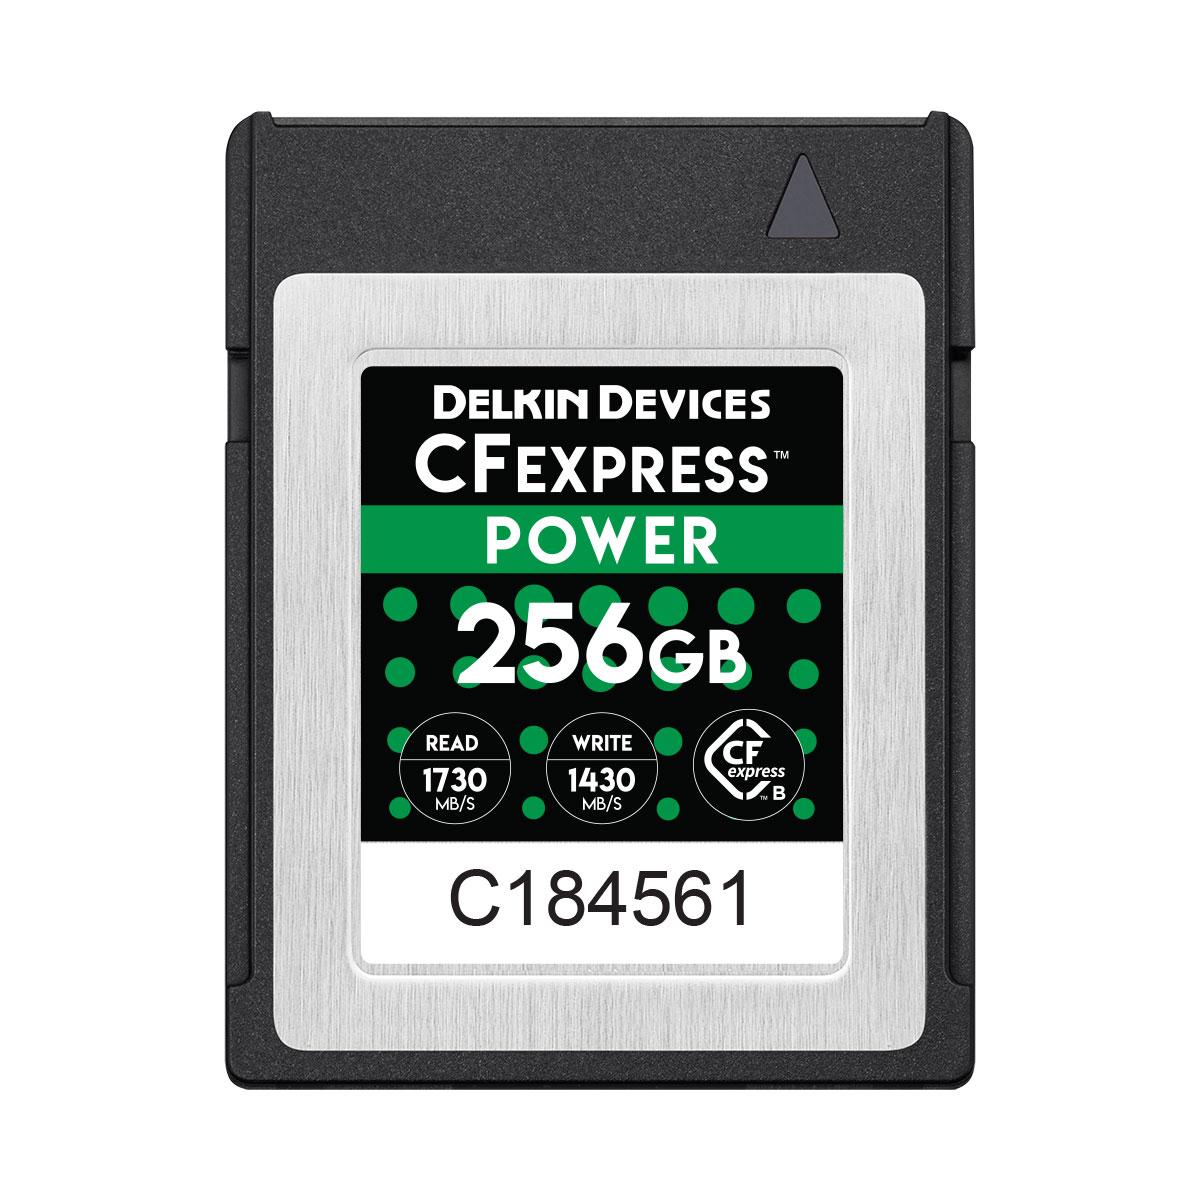 256GB CFexpress POWER メモリーカード